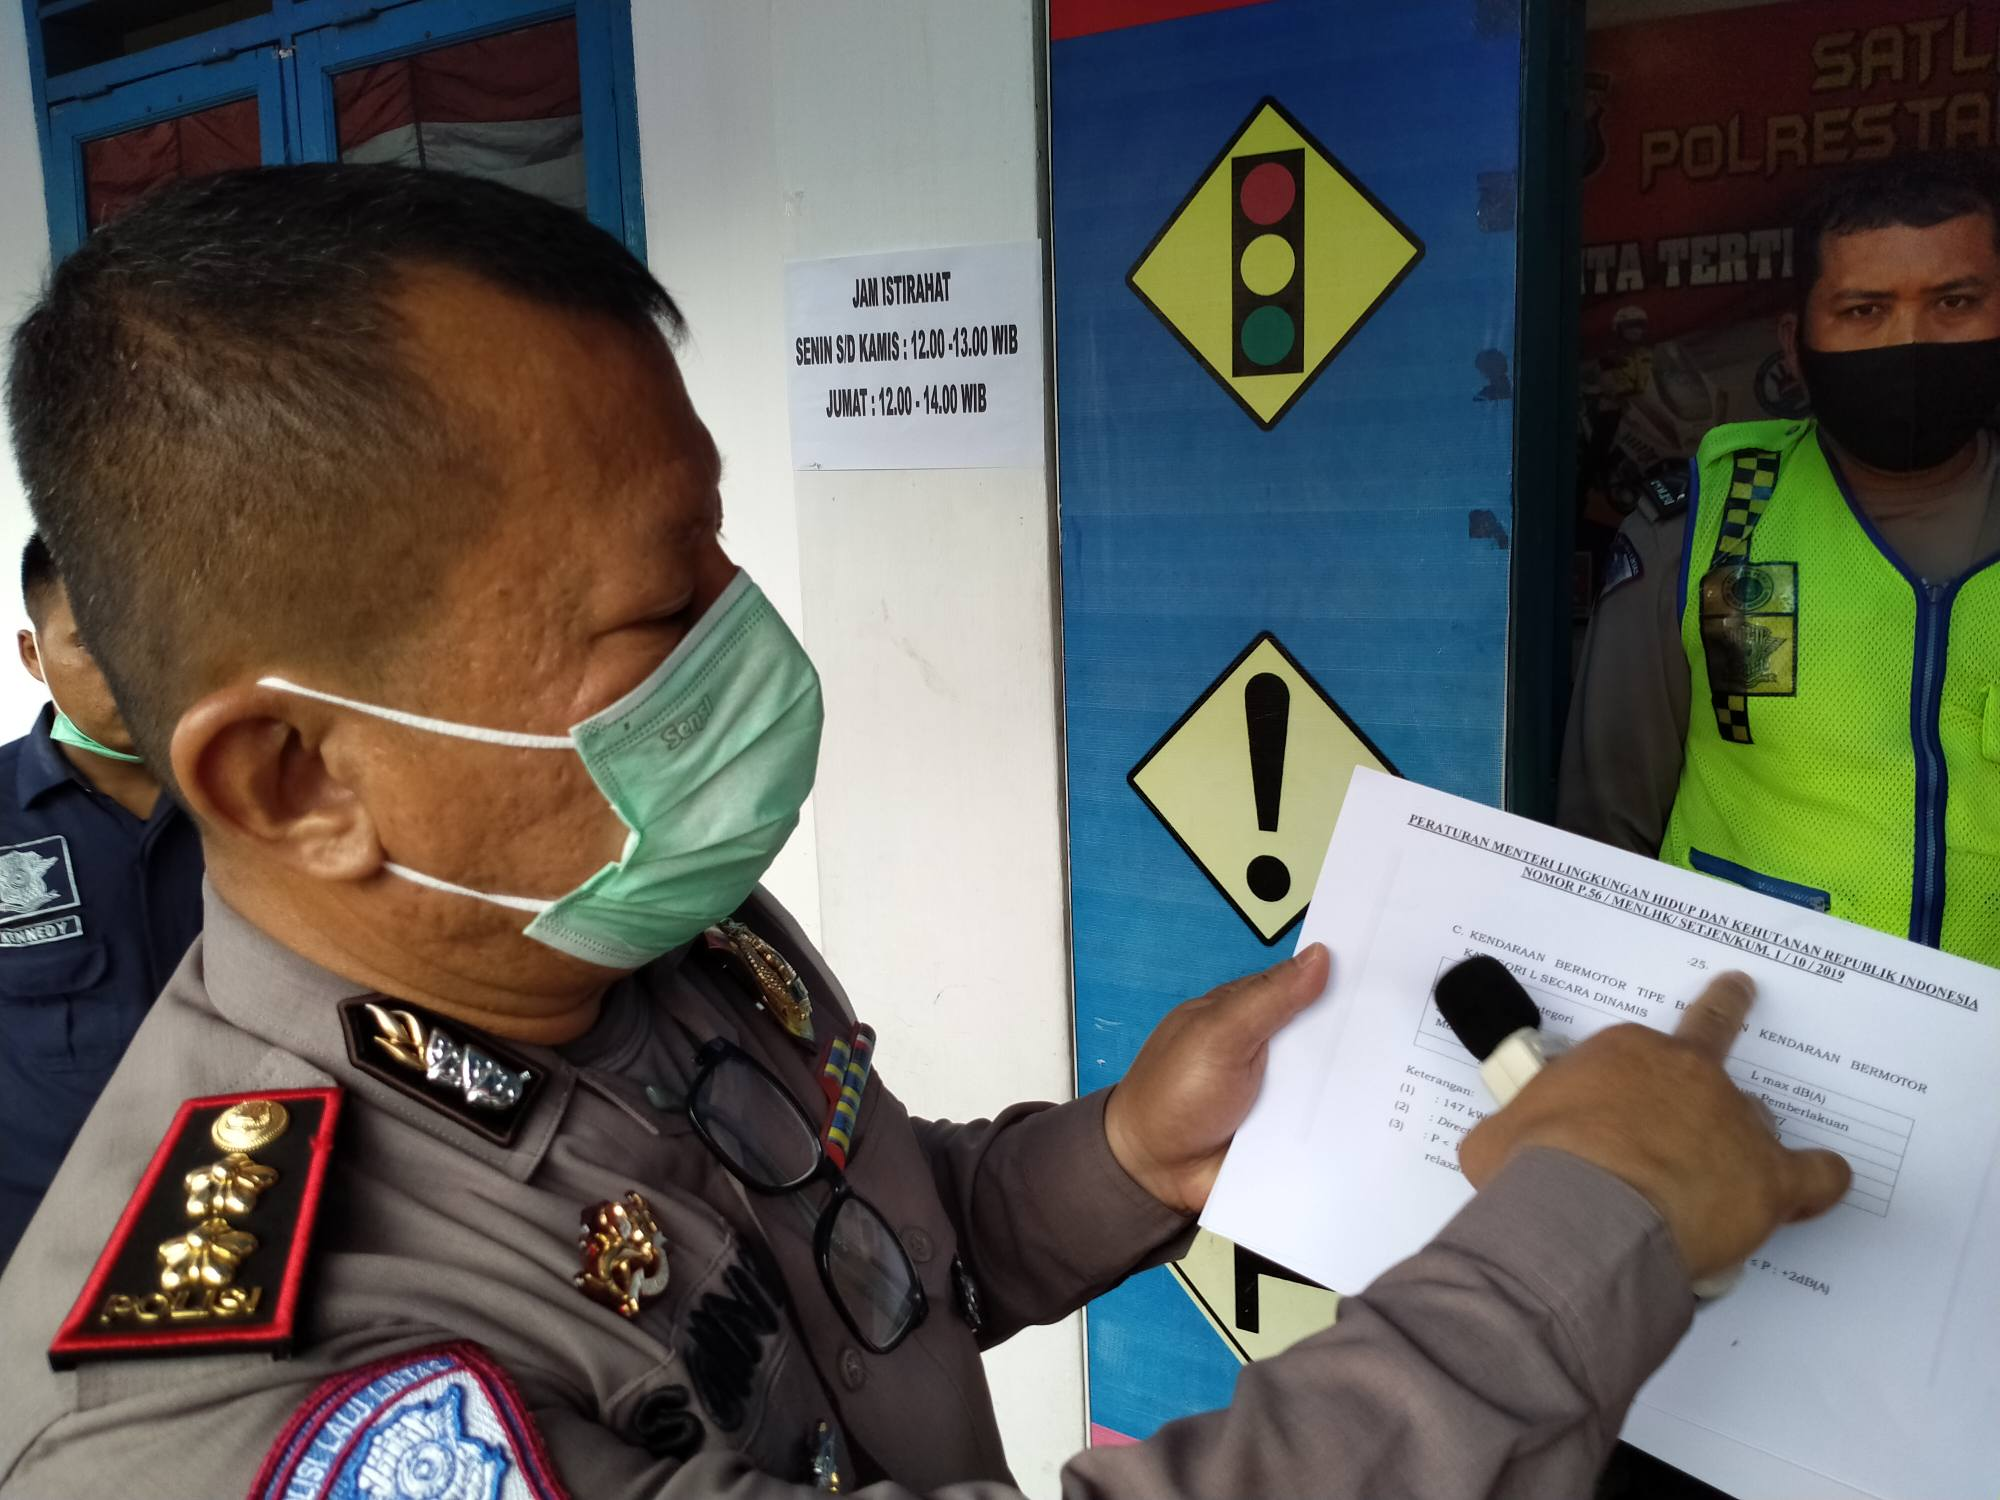 Polrestabes Medan Gunakan 'Sound Noise Level' Tindak Pengendara Pakai Knalpot Blong